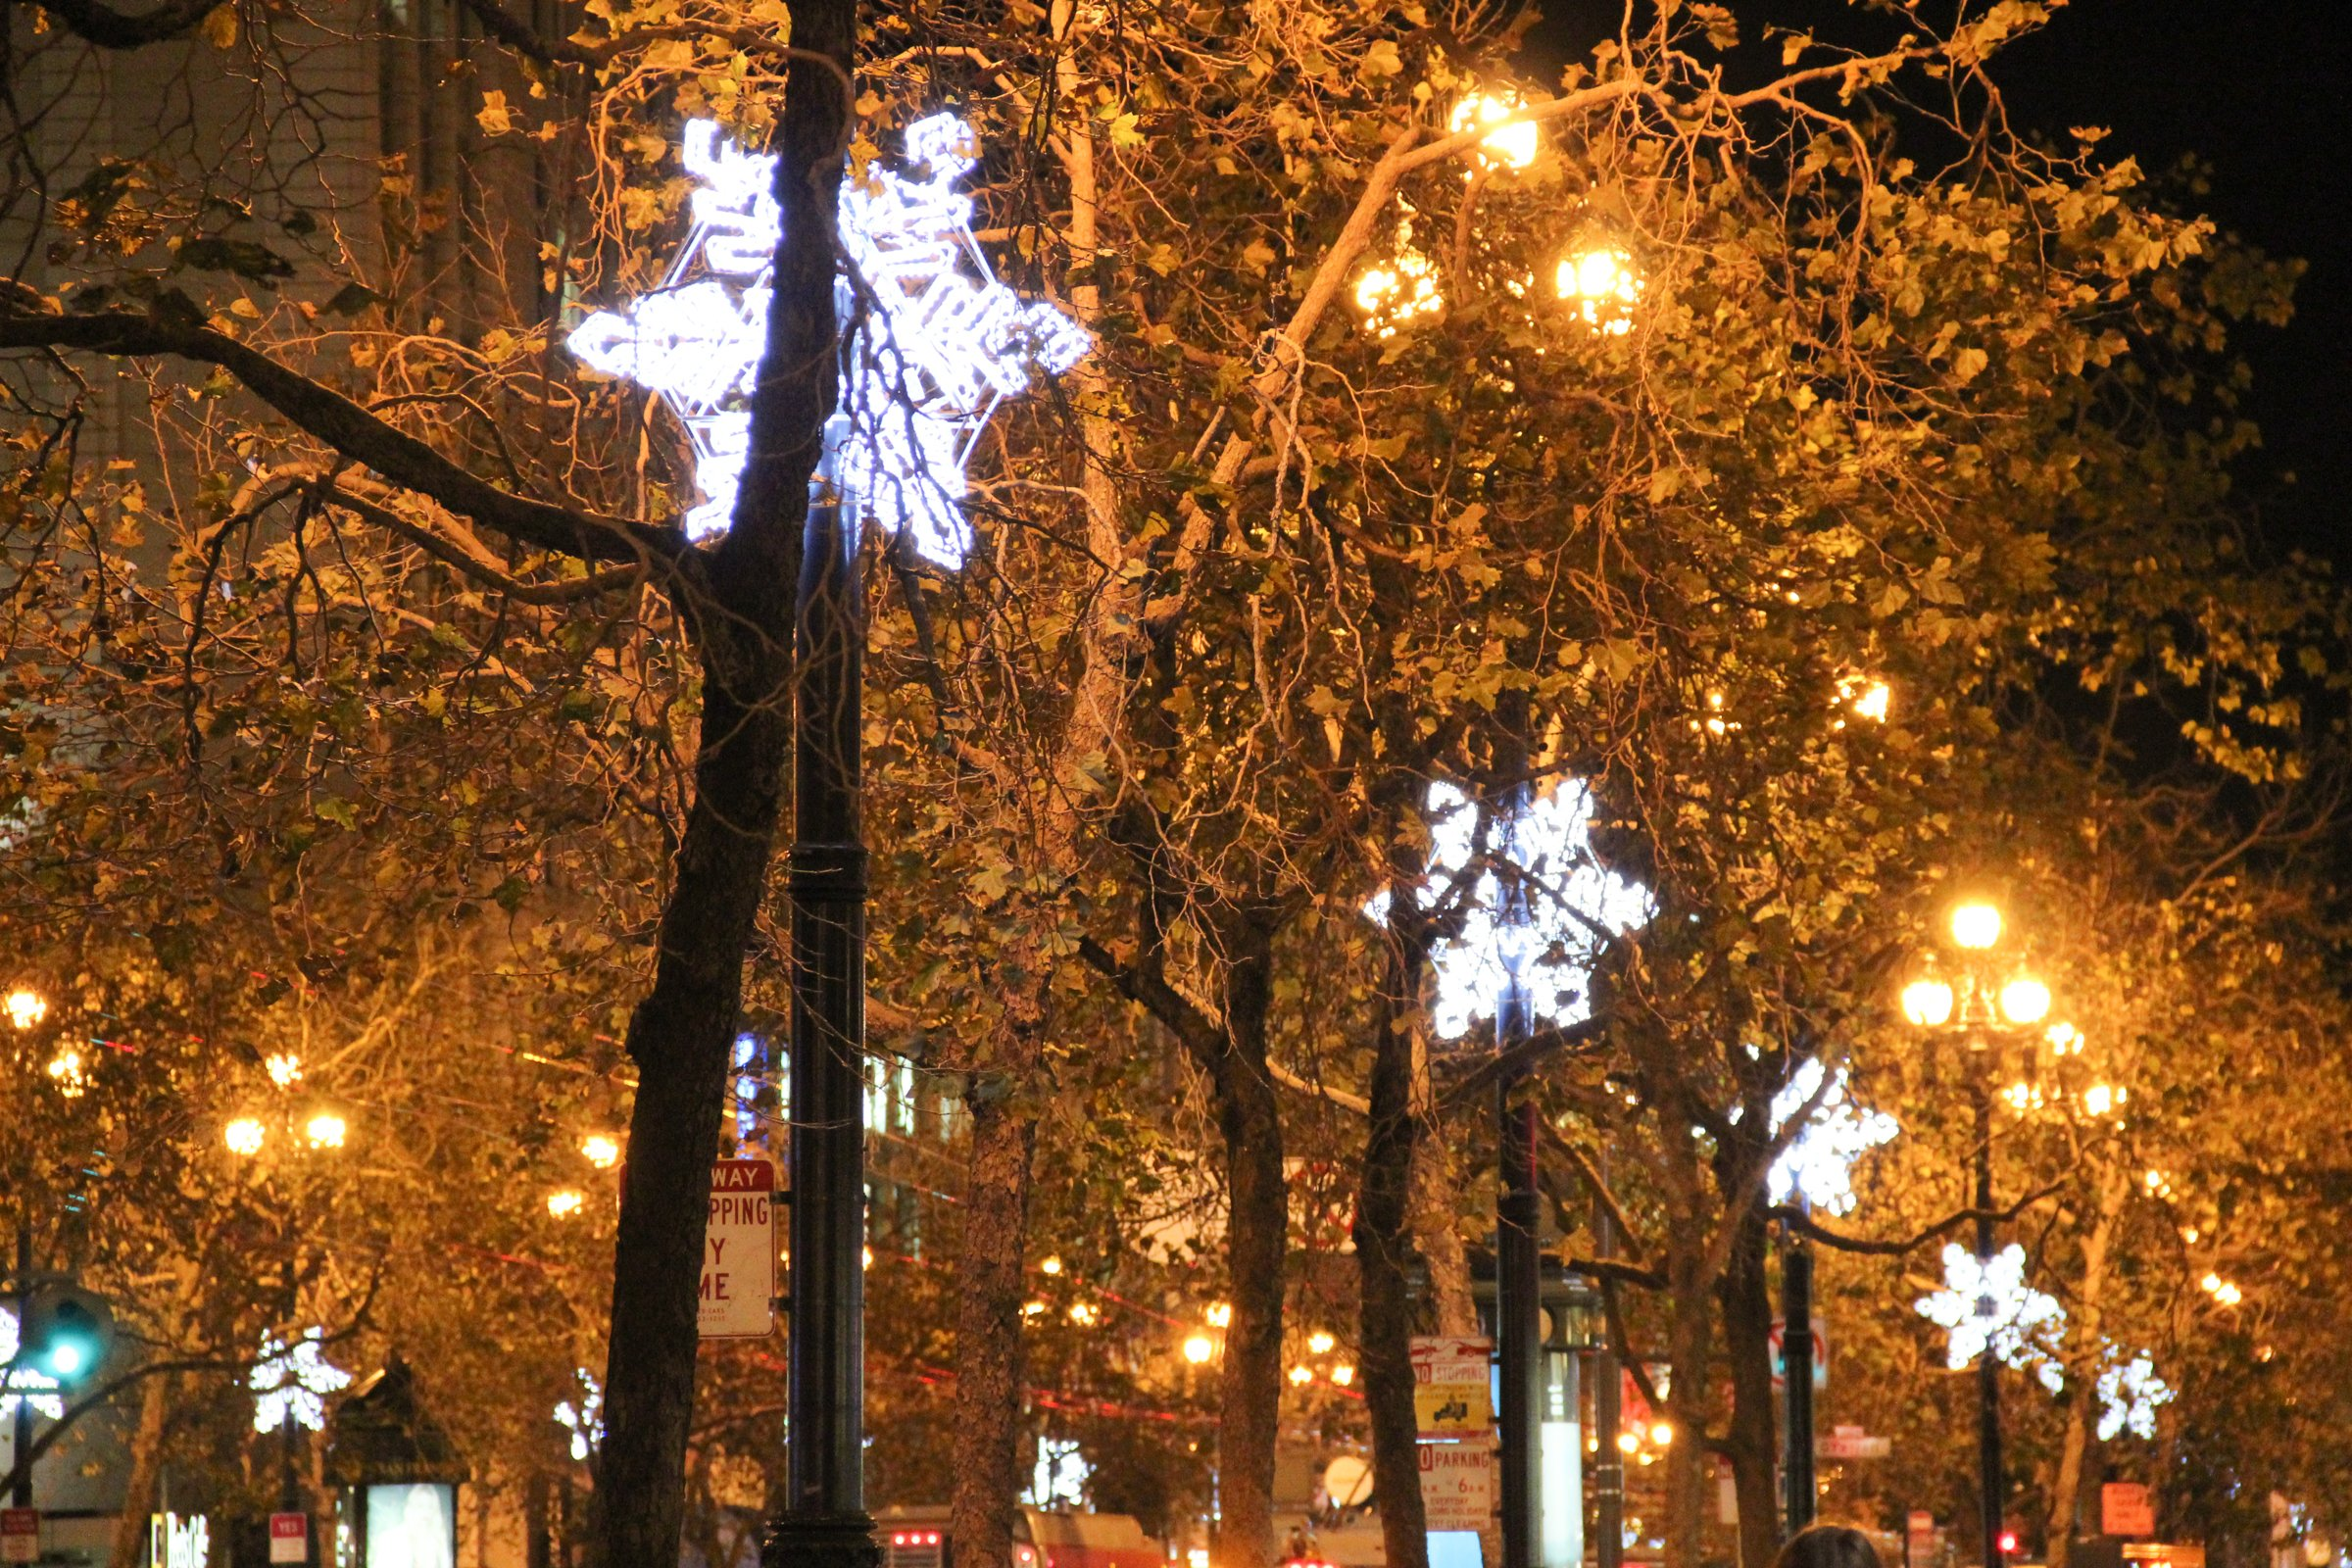 Star Decorations On Streetlights